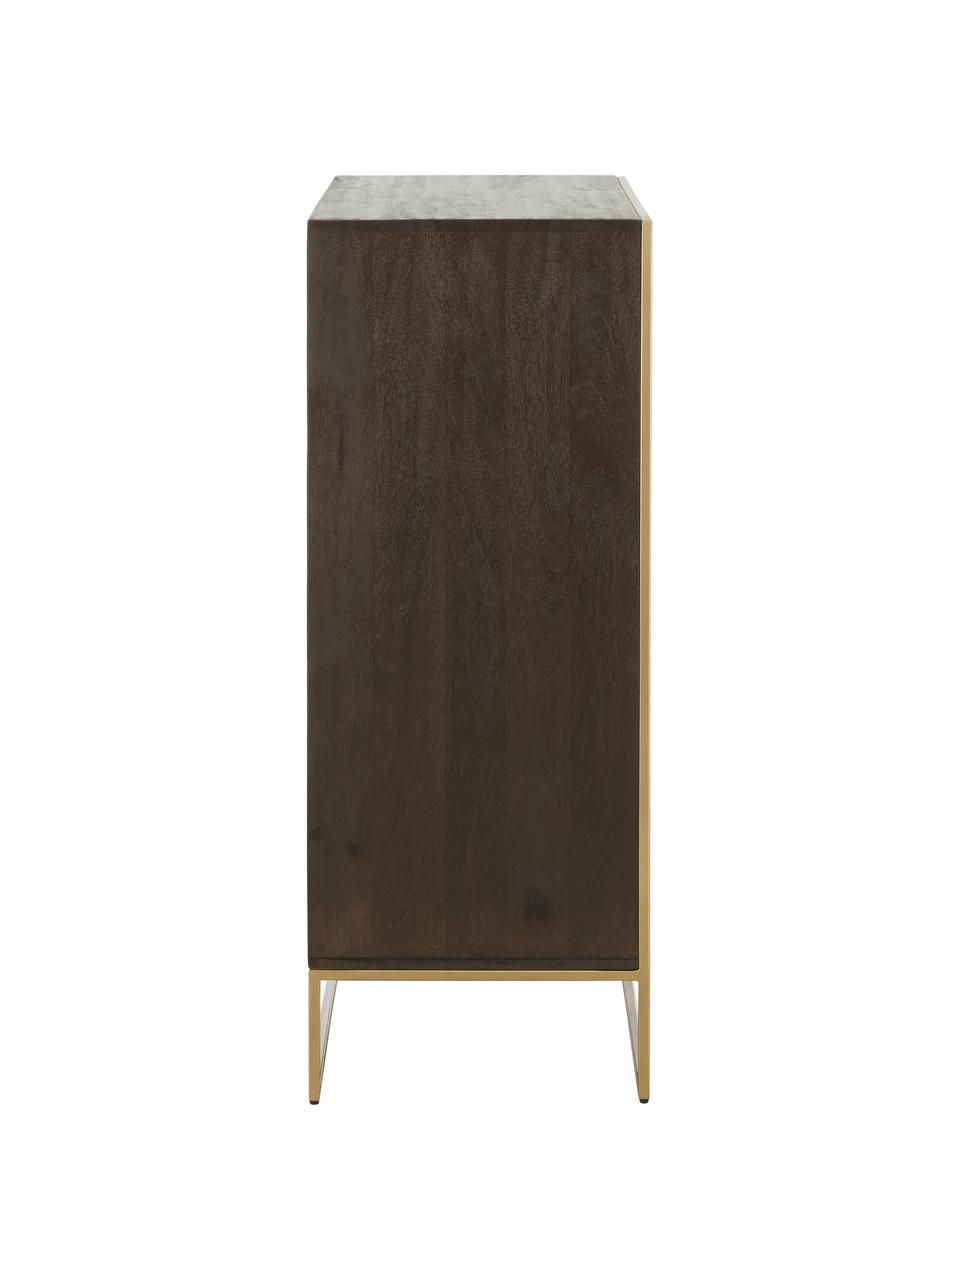 Highboard Harry aus massivem Mangoholz, Korpus: Massives Mangoholz, lacki, Mangoholz, Goldfarben, 100 x 120 cm